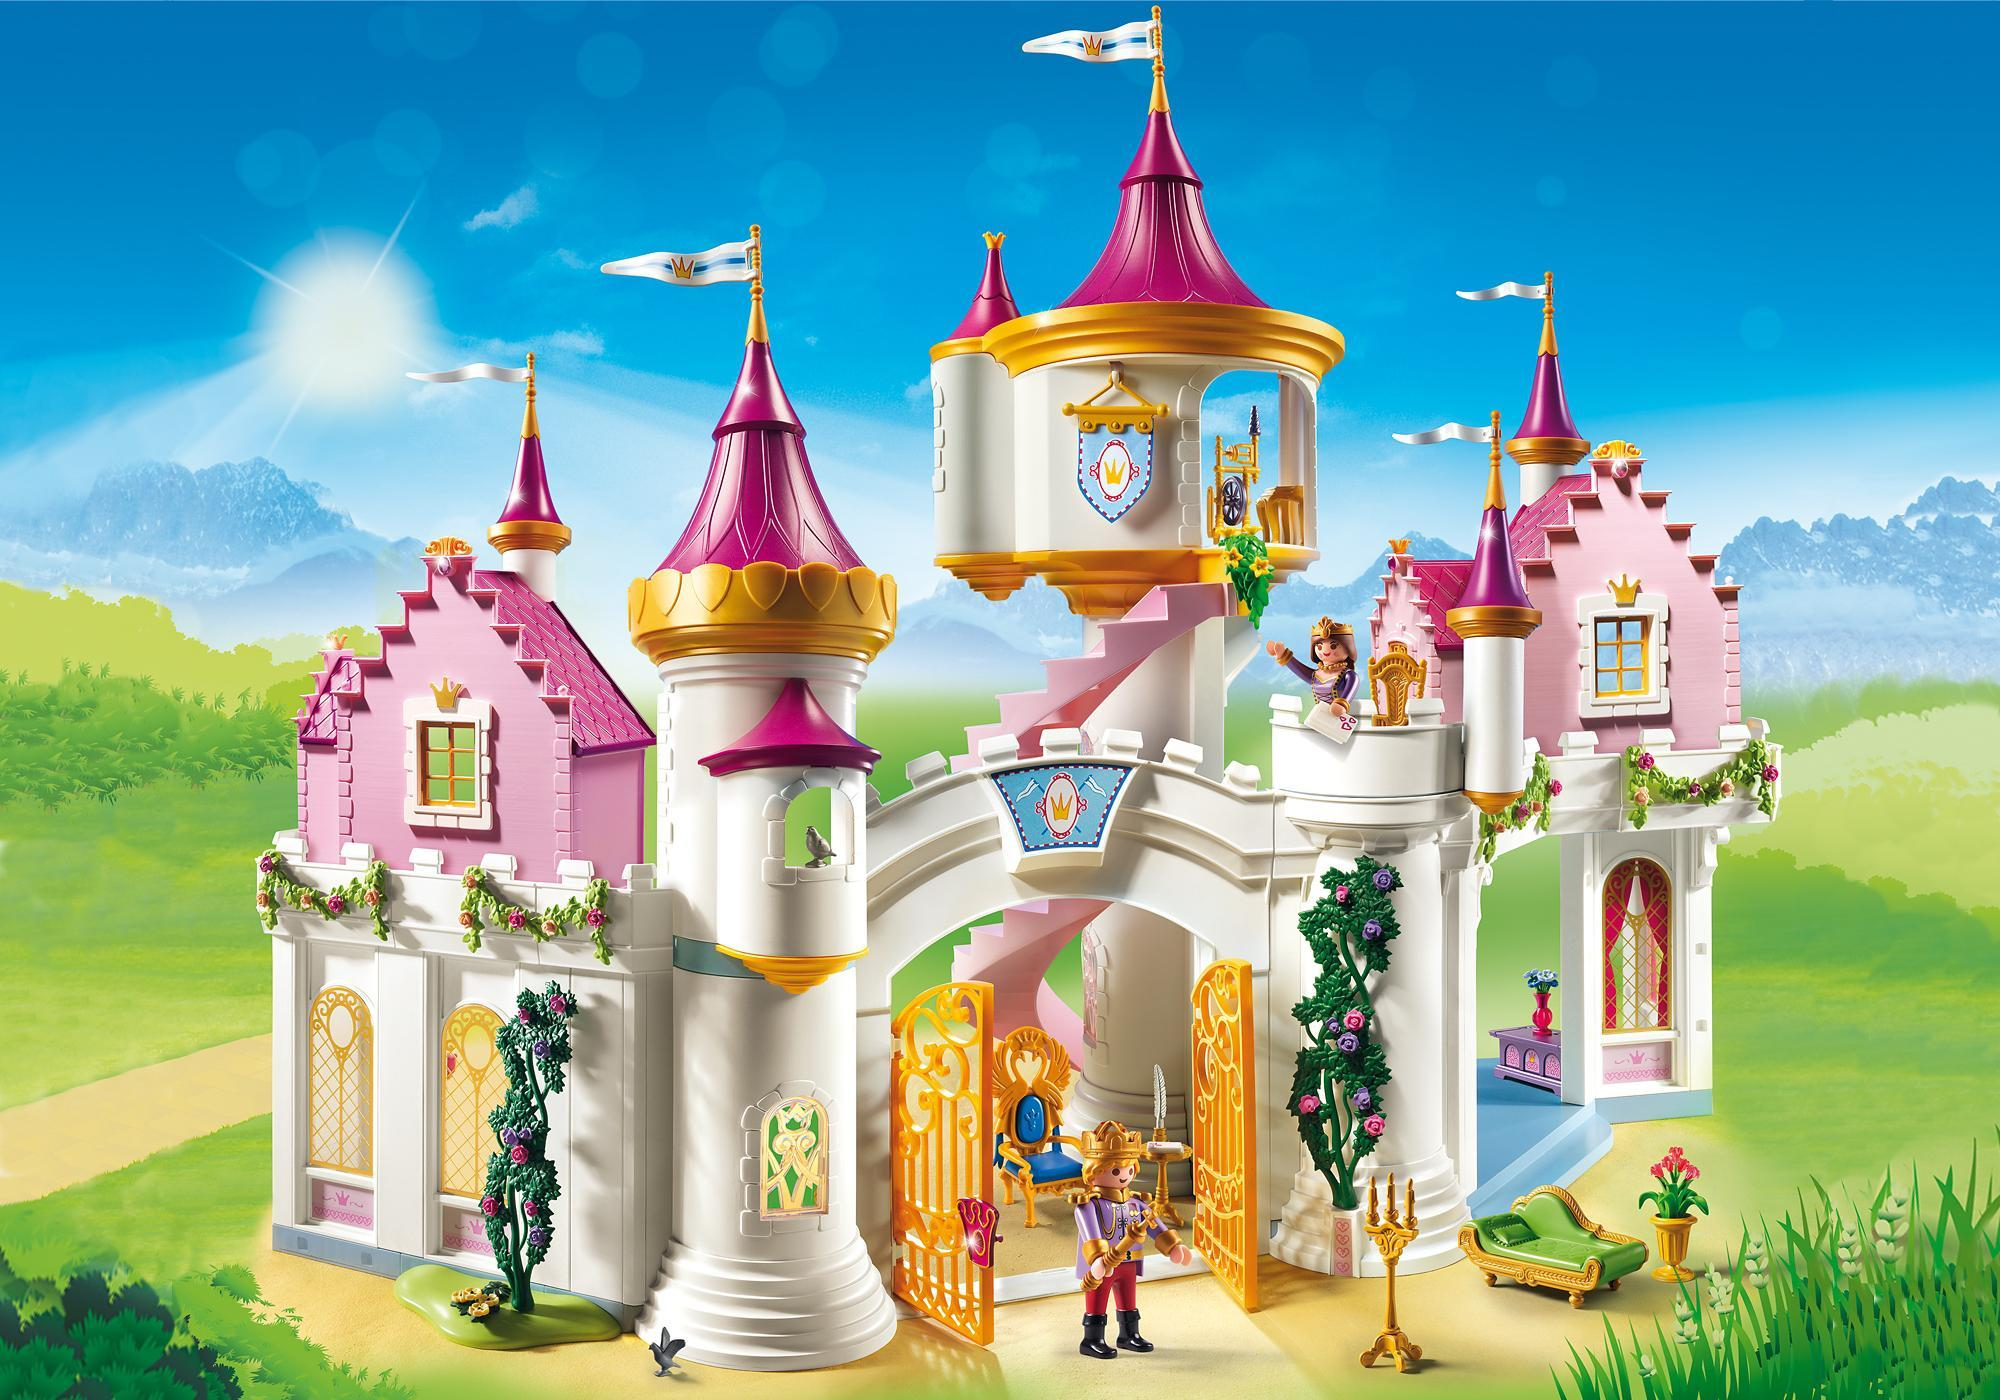 http://media.playmobil.com/i/playmobil/6848_product_detail/Prinzessinnenschloss